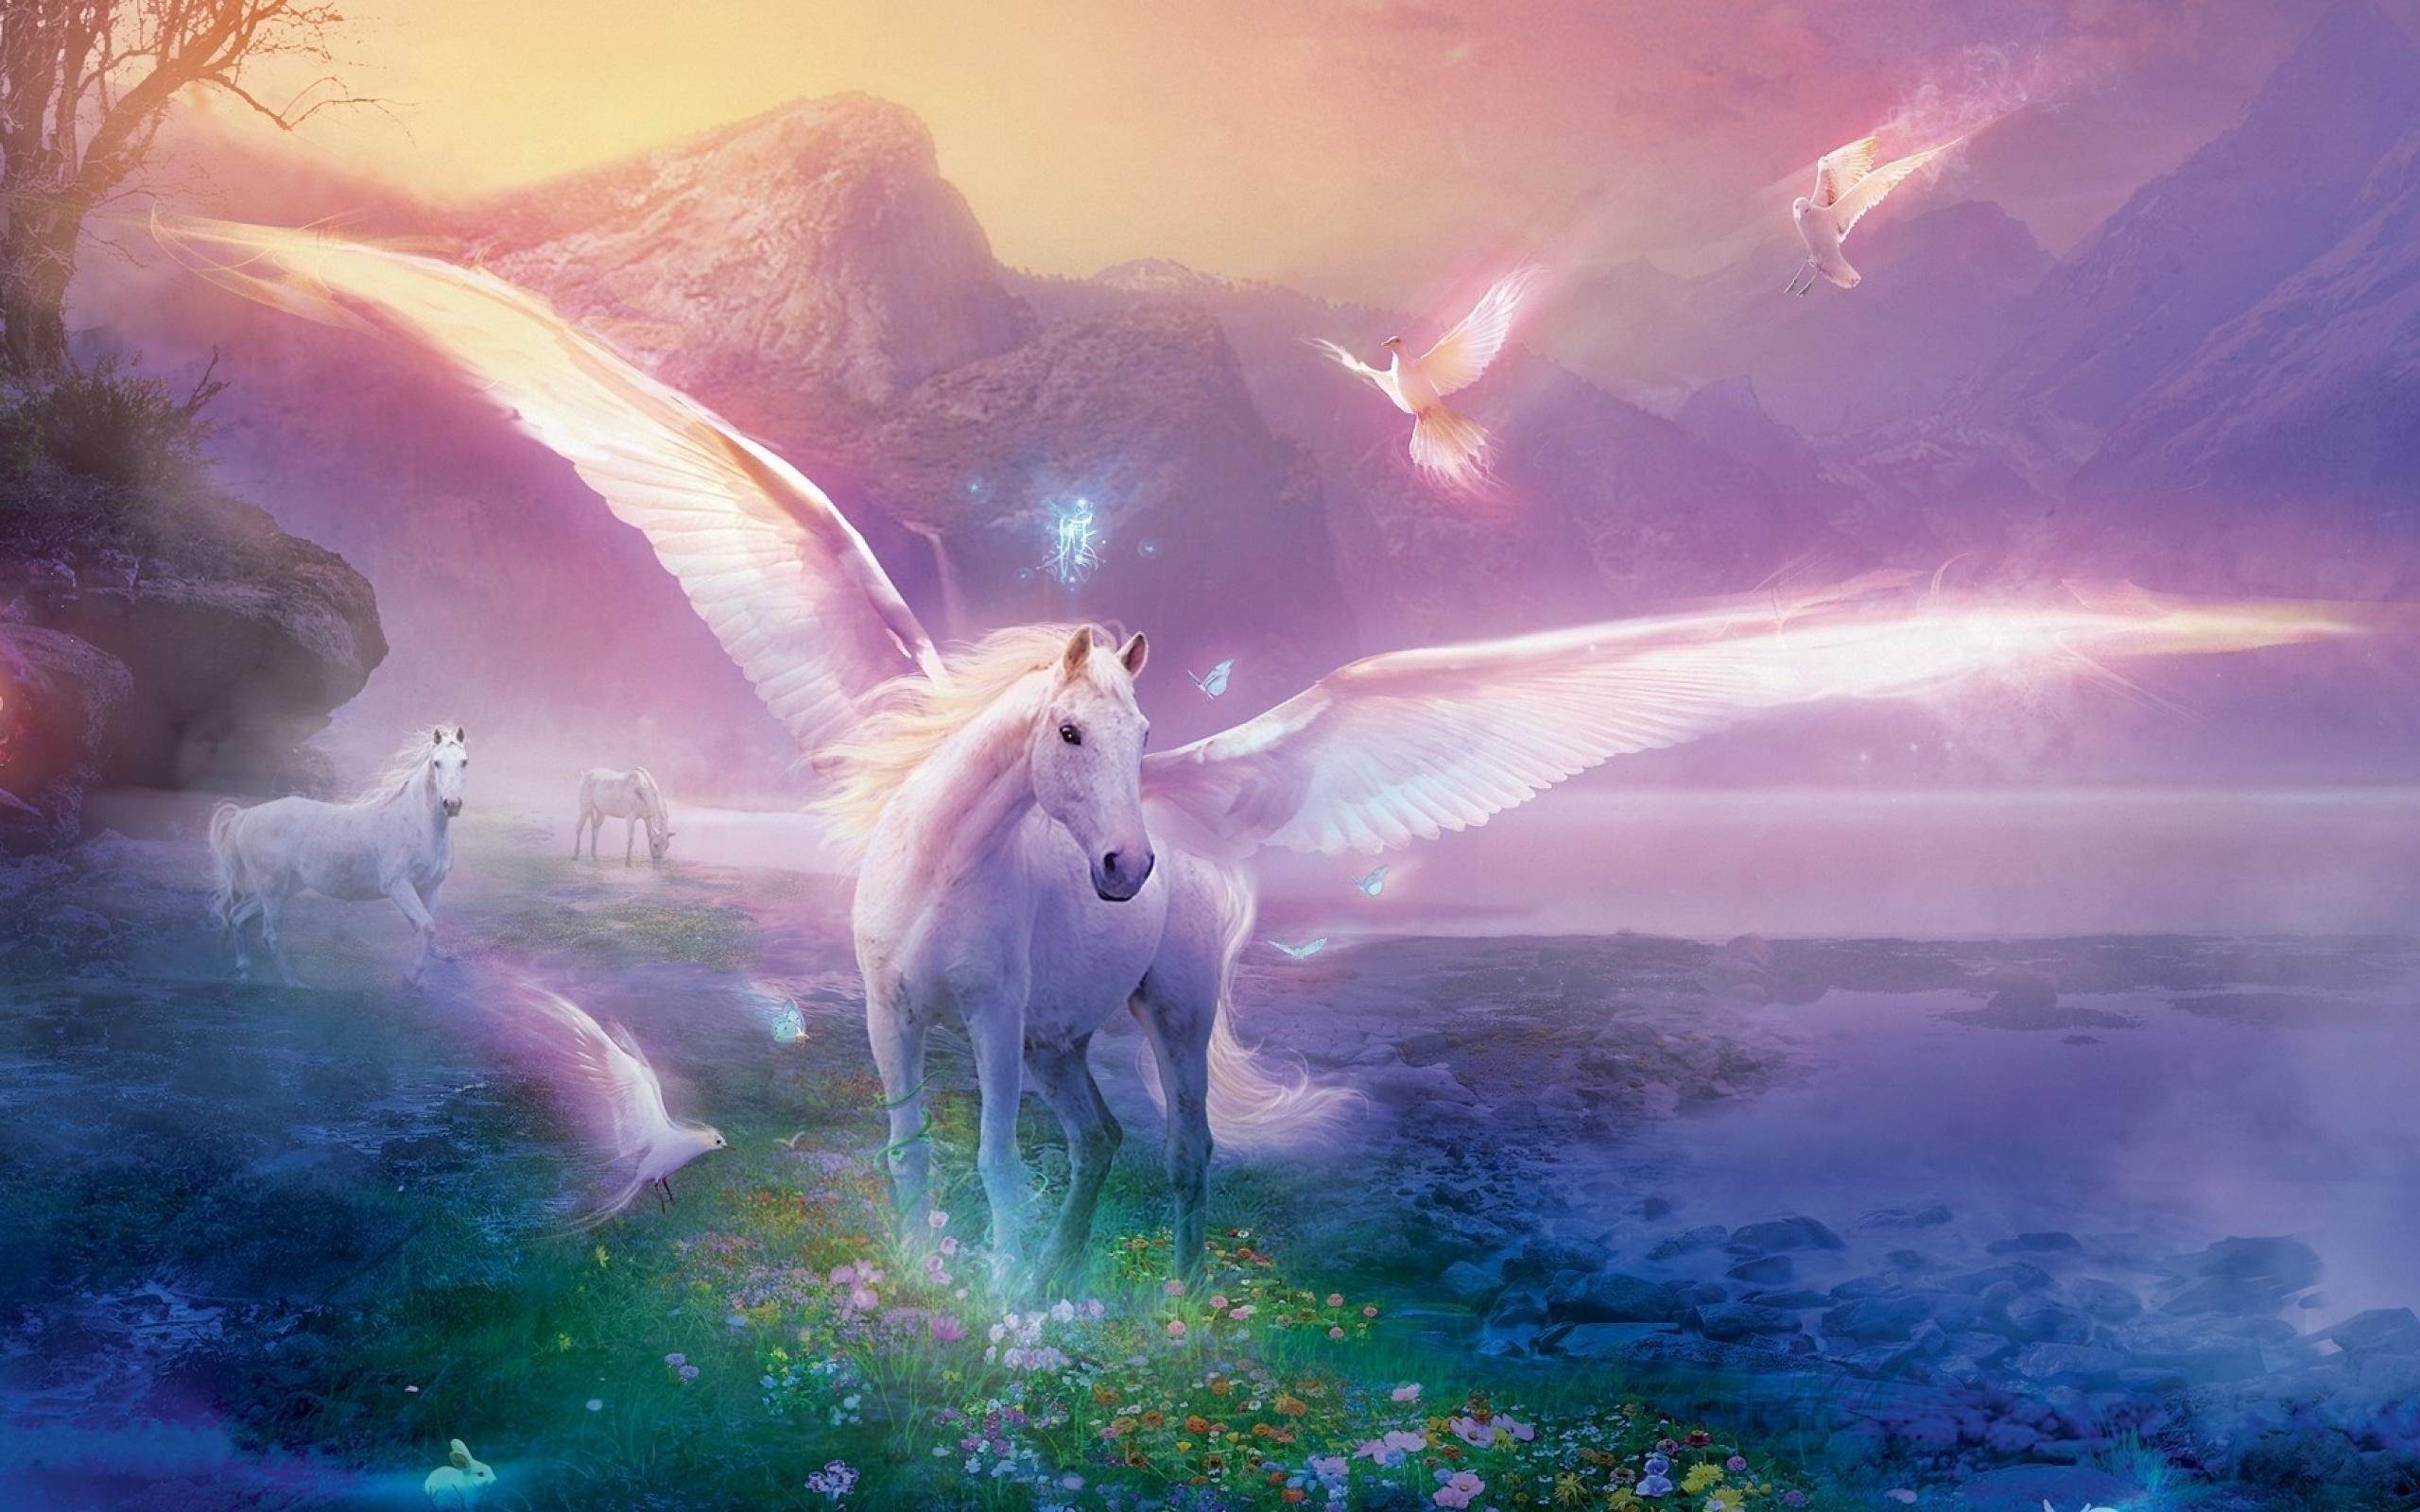 57 Unicorn HD Wallpapers Backgrounds 2560x1600